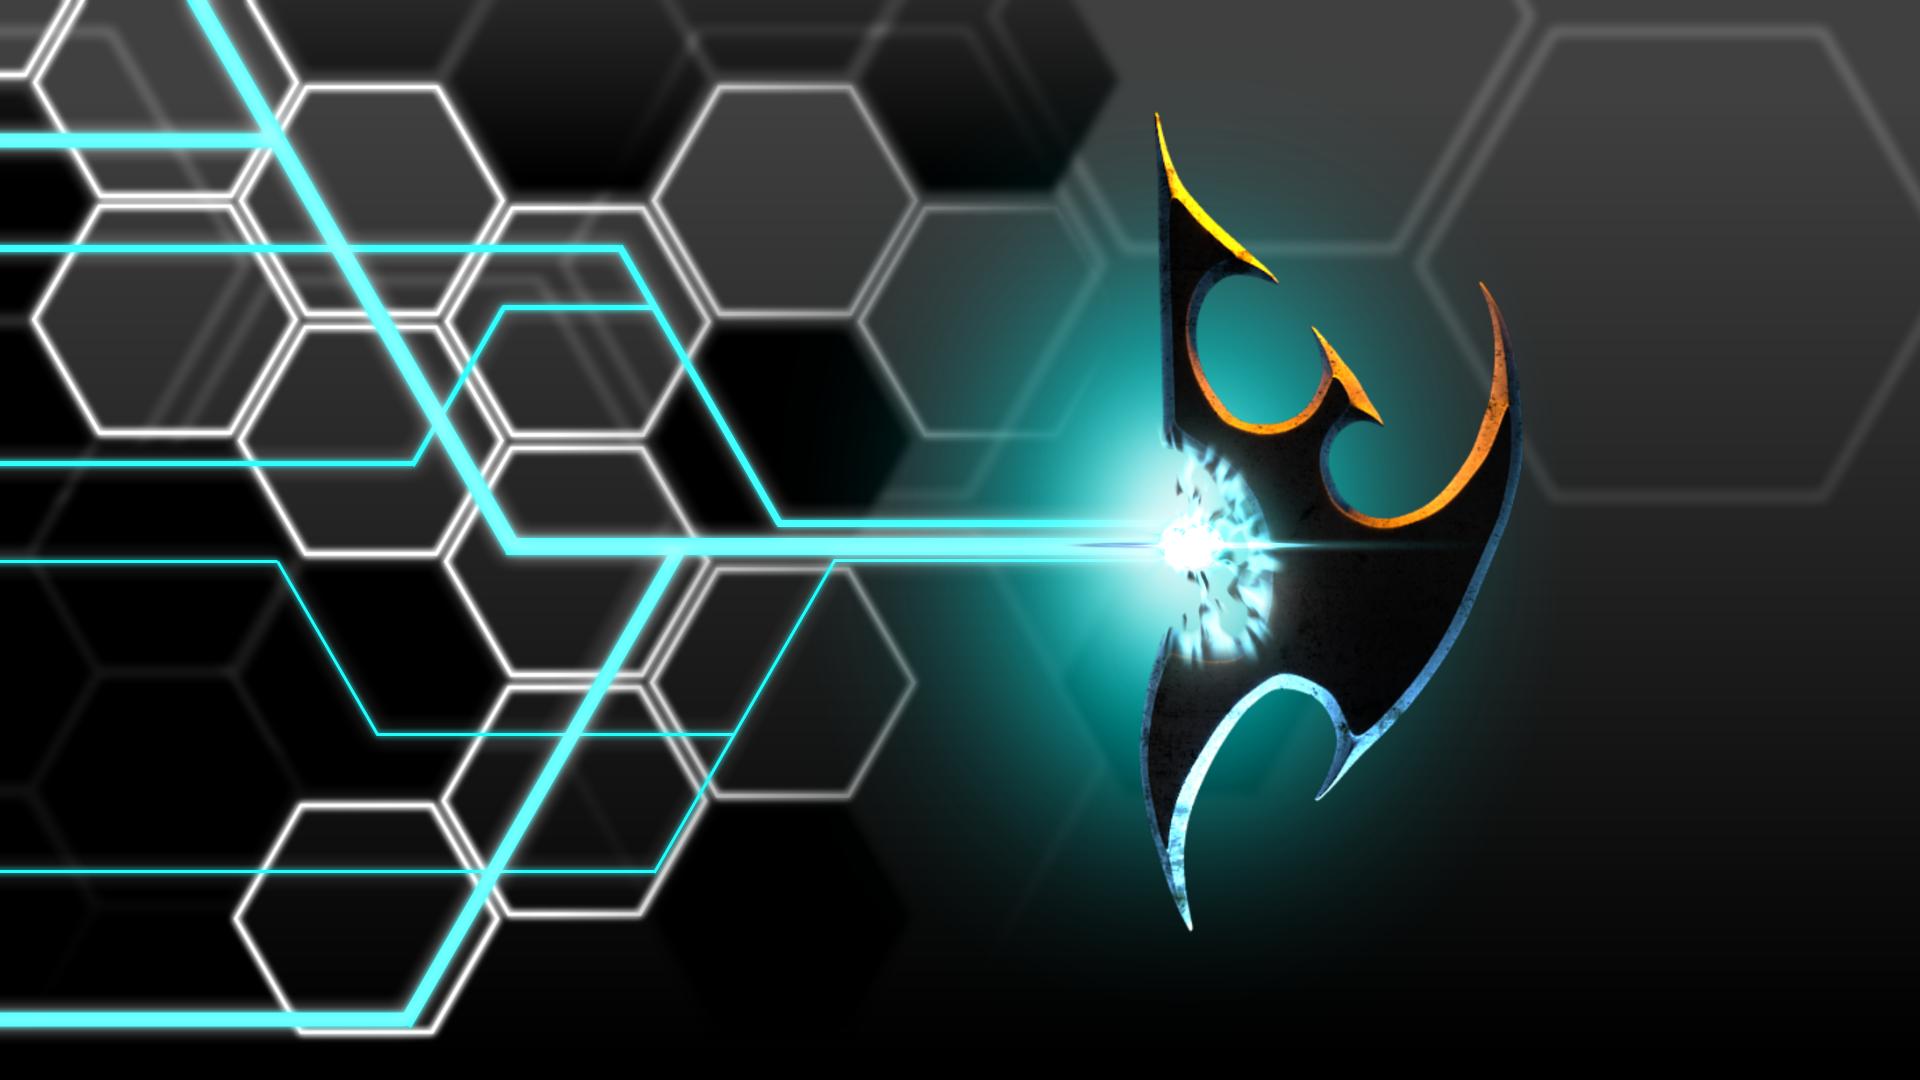 download Starcraft 2 Protoss wallpaper 123488 [1920x1080] for 1920x1080